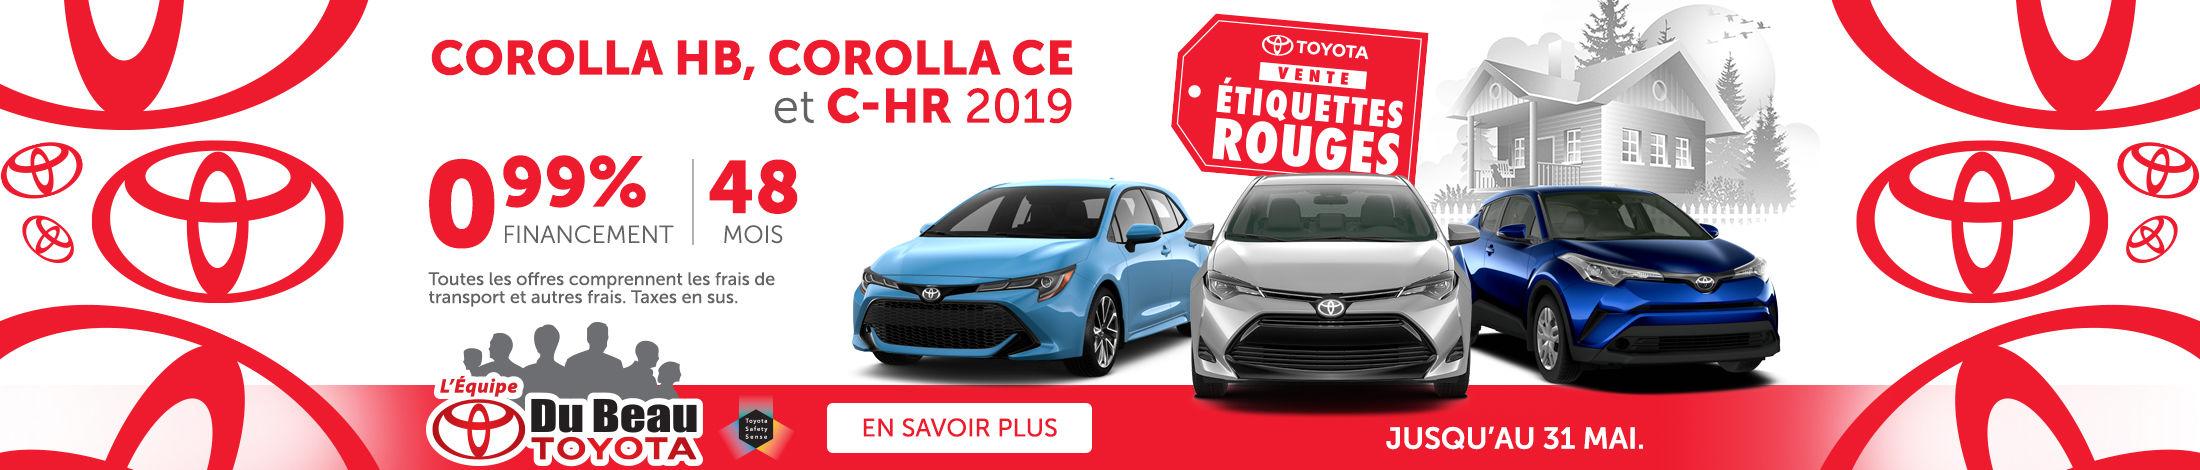 Corolla CE 2019, Corolla HB 2019, C-HR 2019